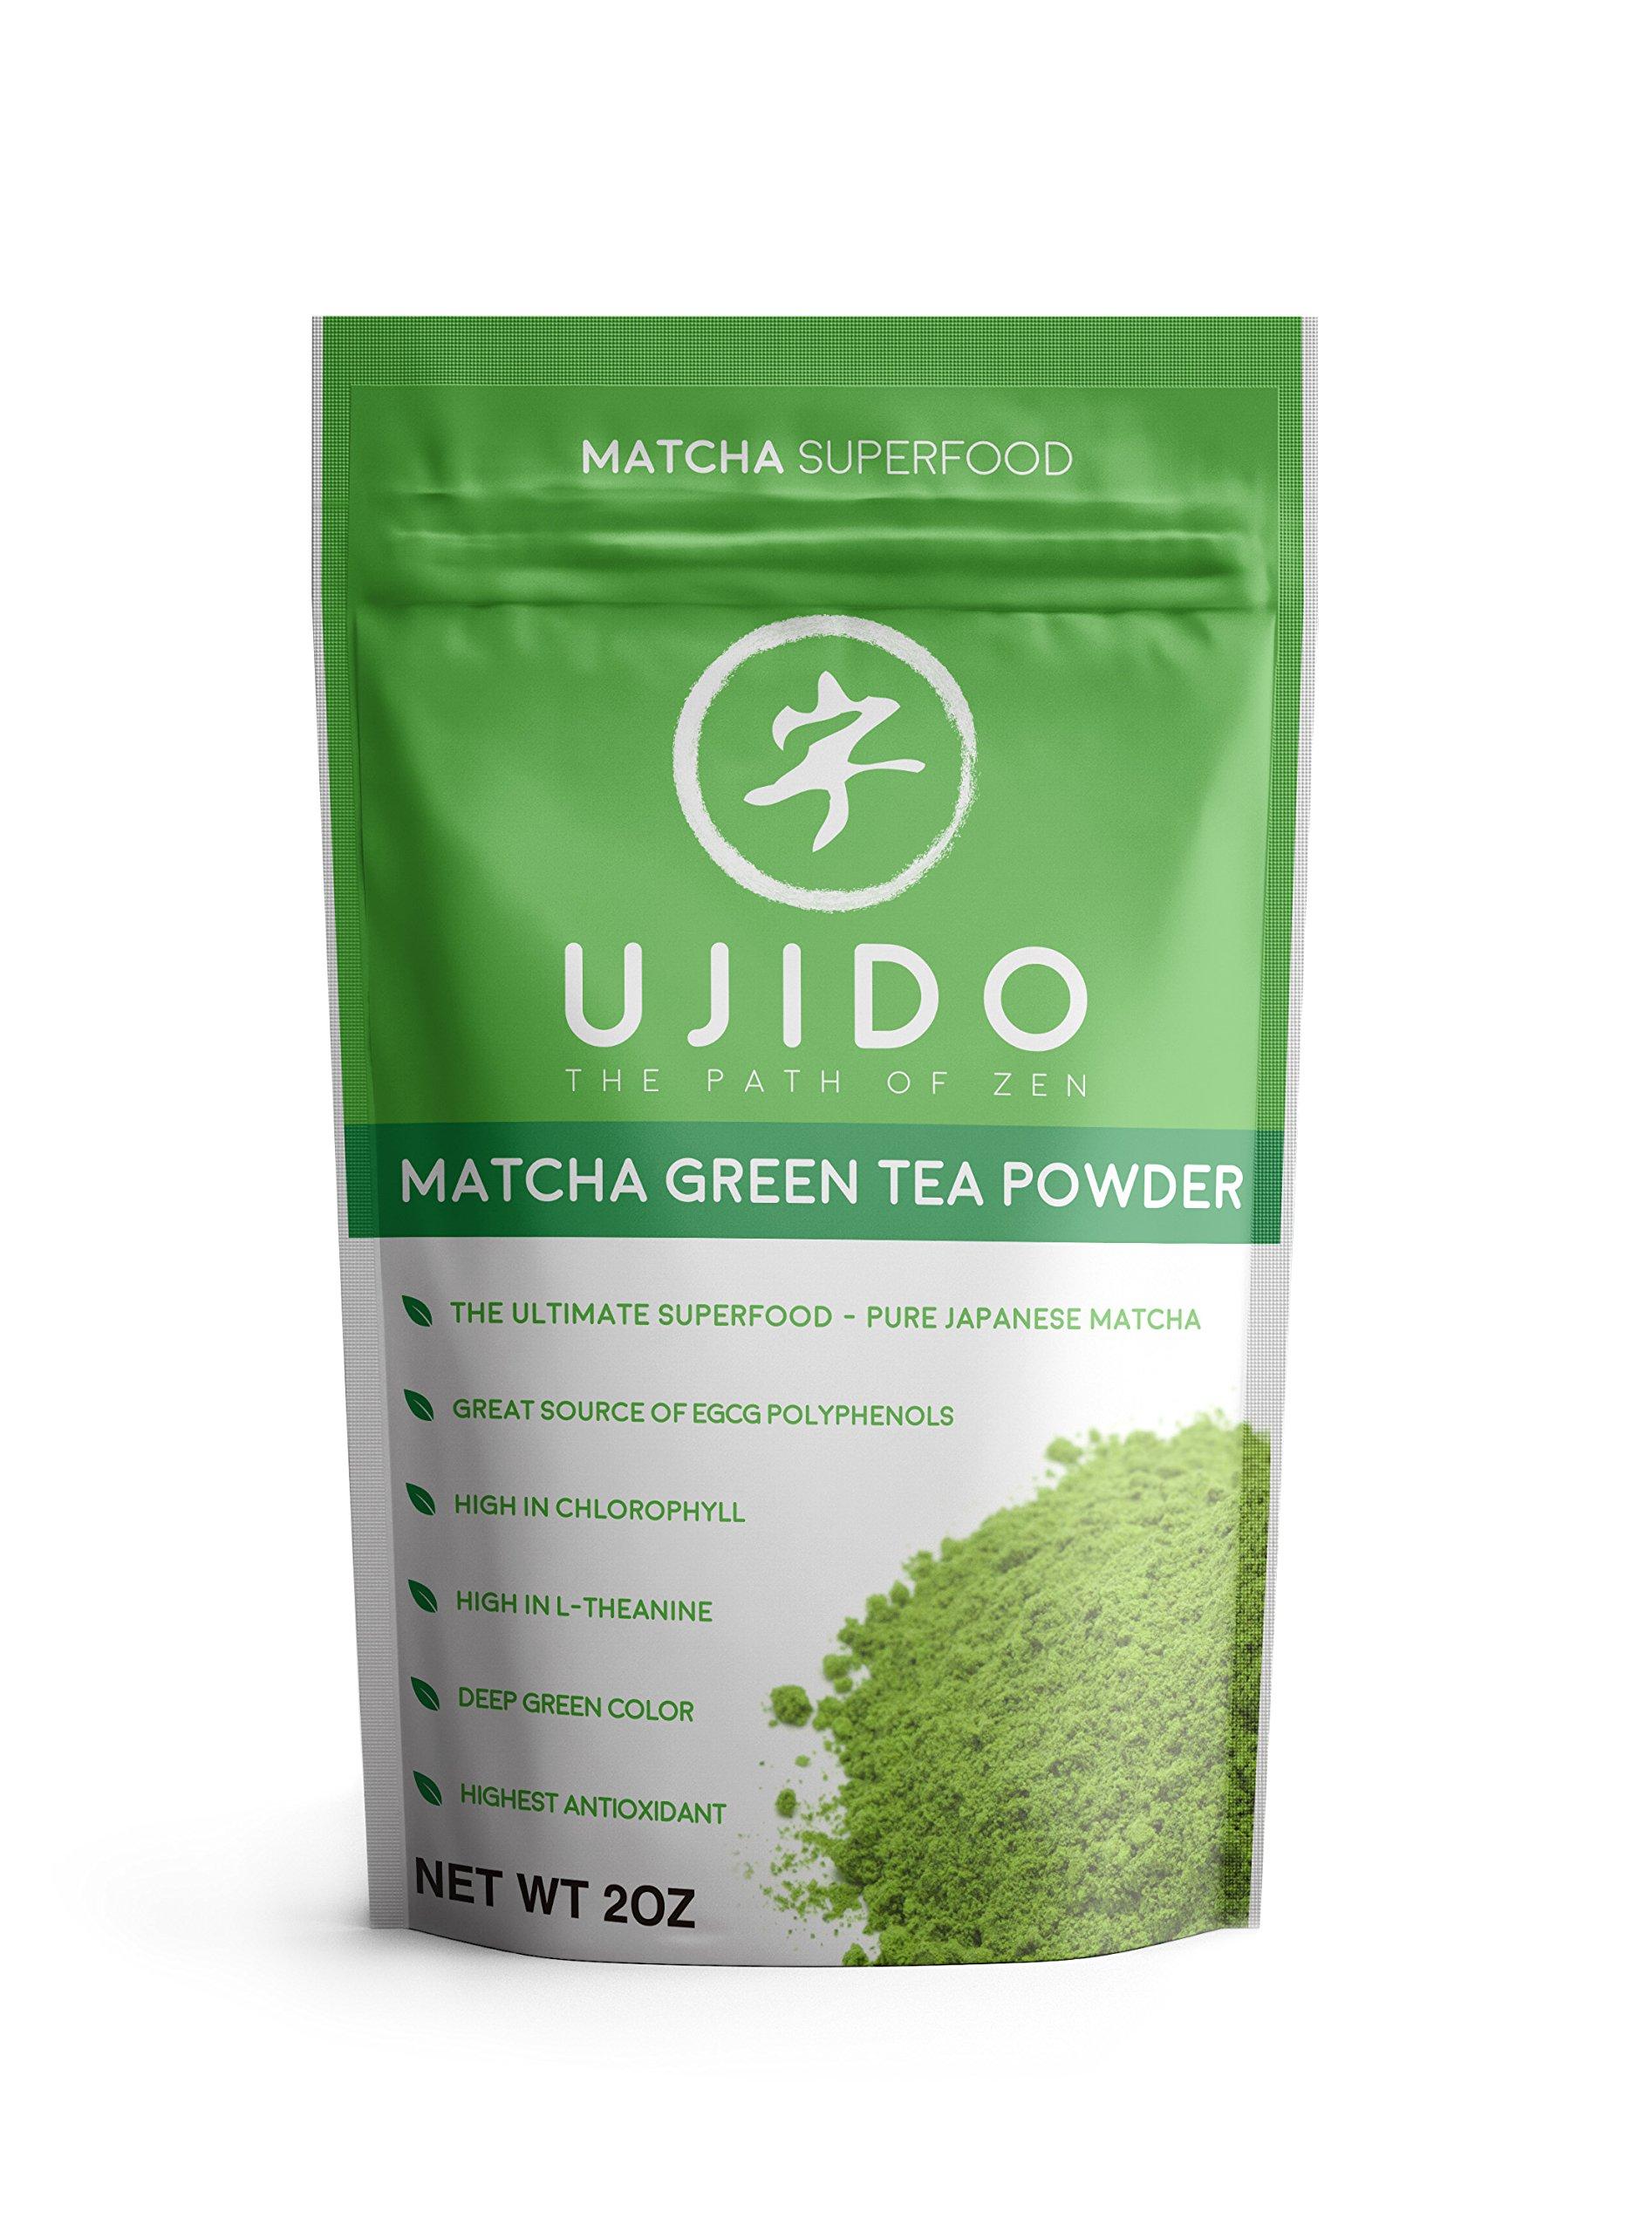 Ujido Japanese Matcha Green Tea Powder - Packaged in Japan (2 oz)